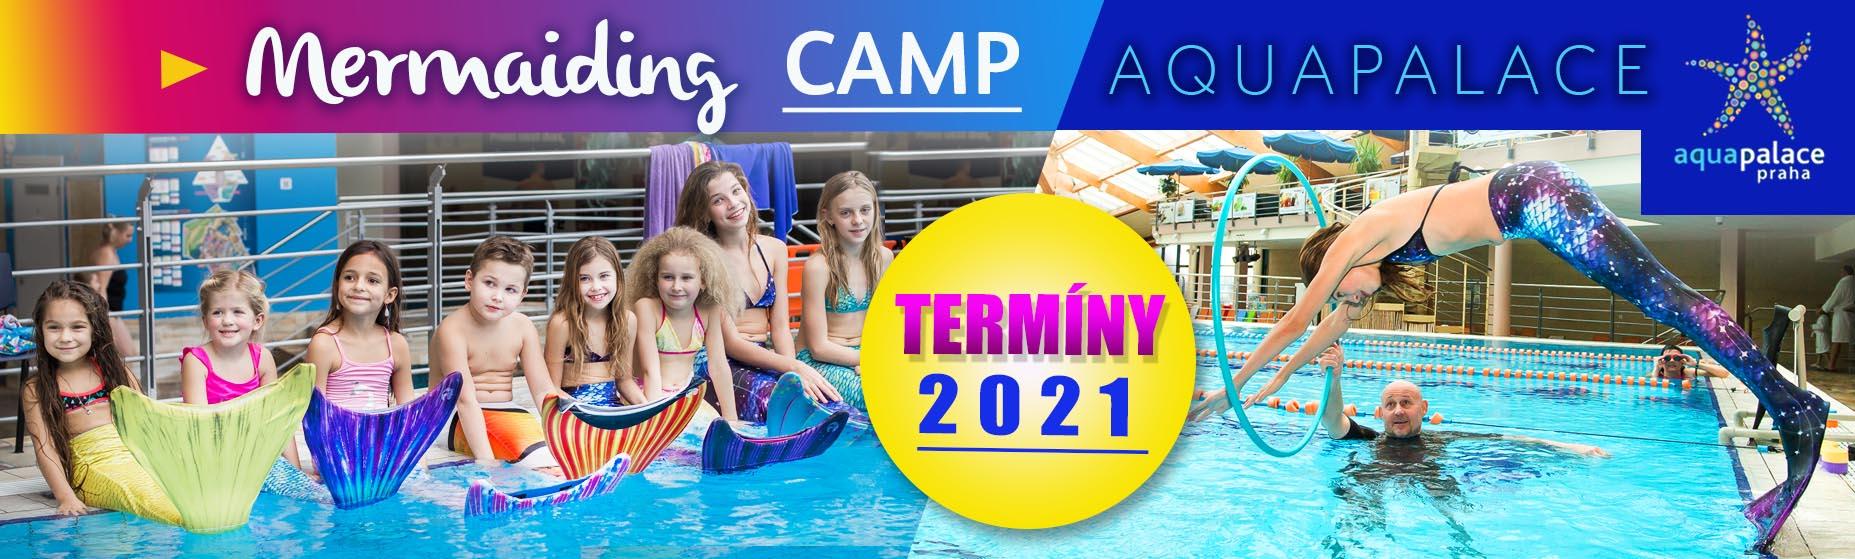 marmaiding_camp_2021_